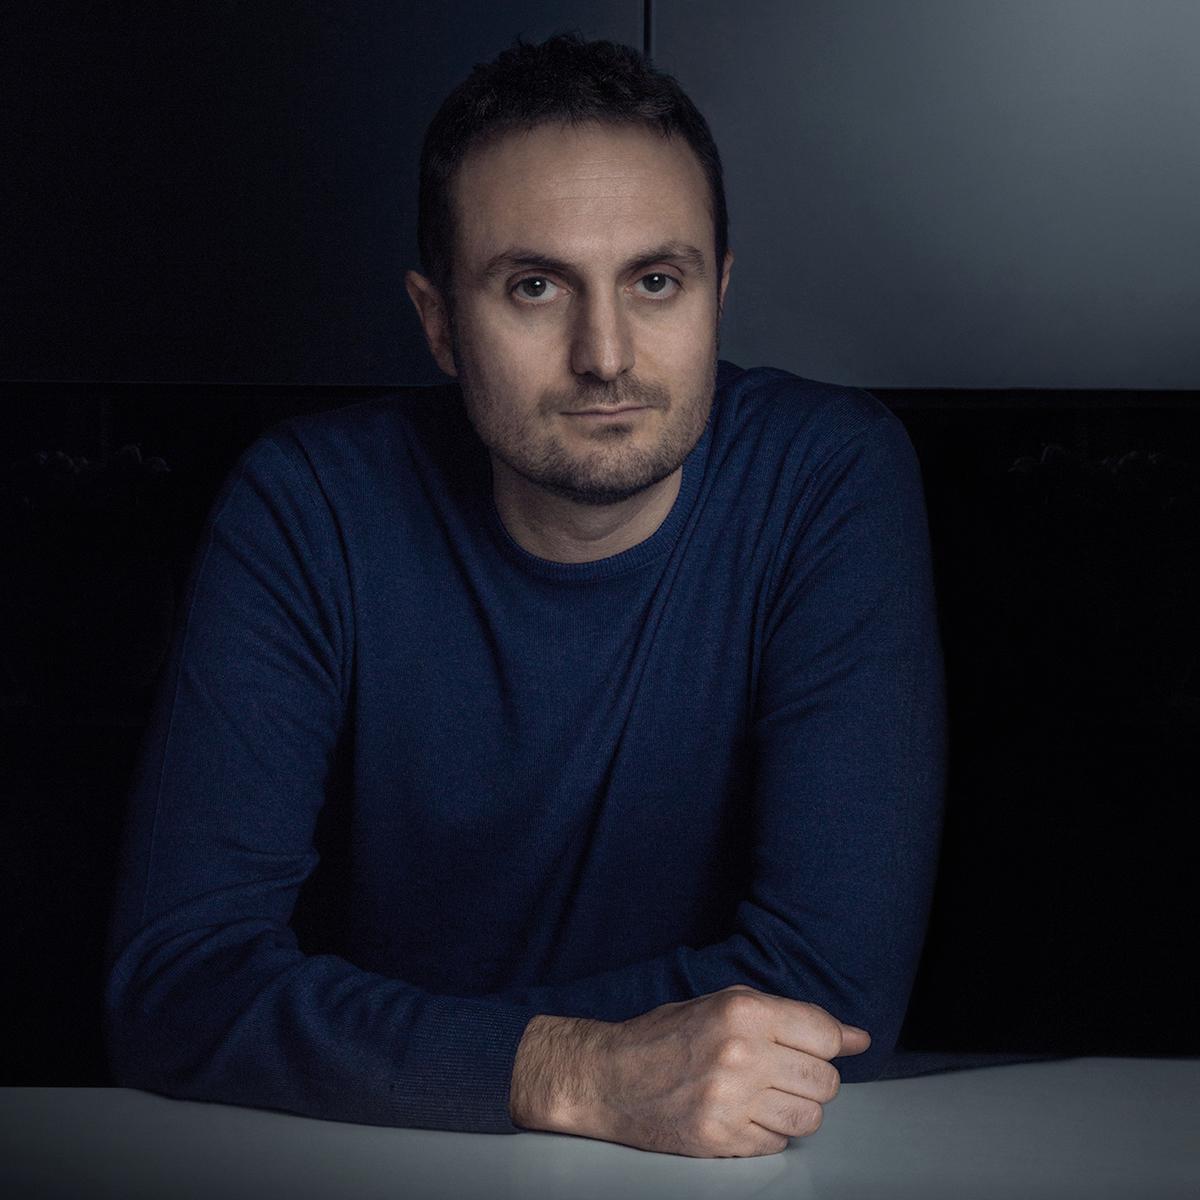 marco-venturelli-publicis-milan-publicis-conseil-2019